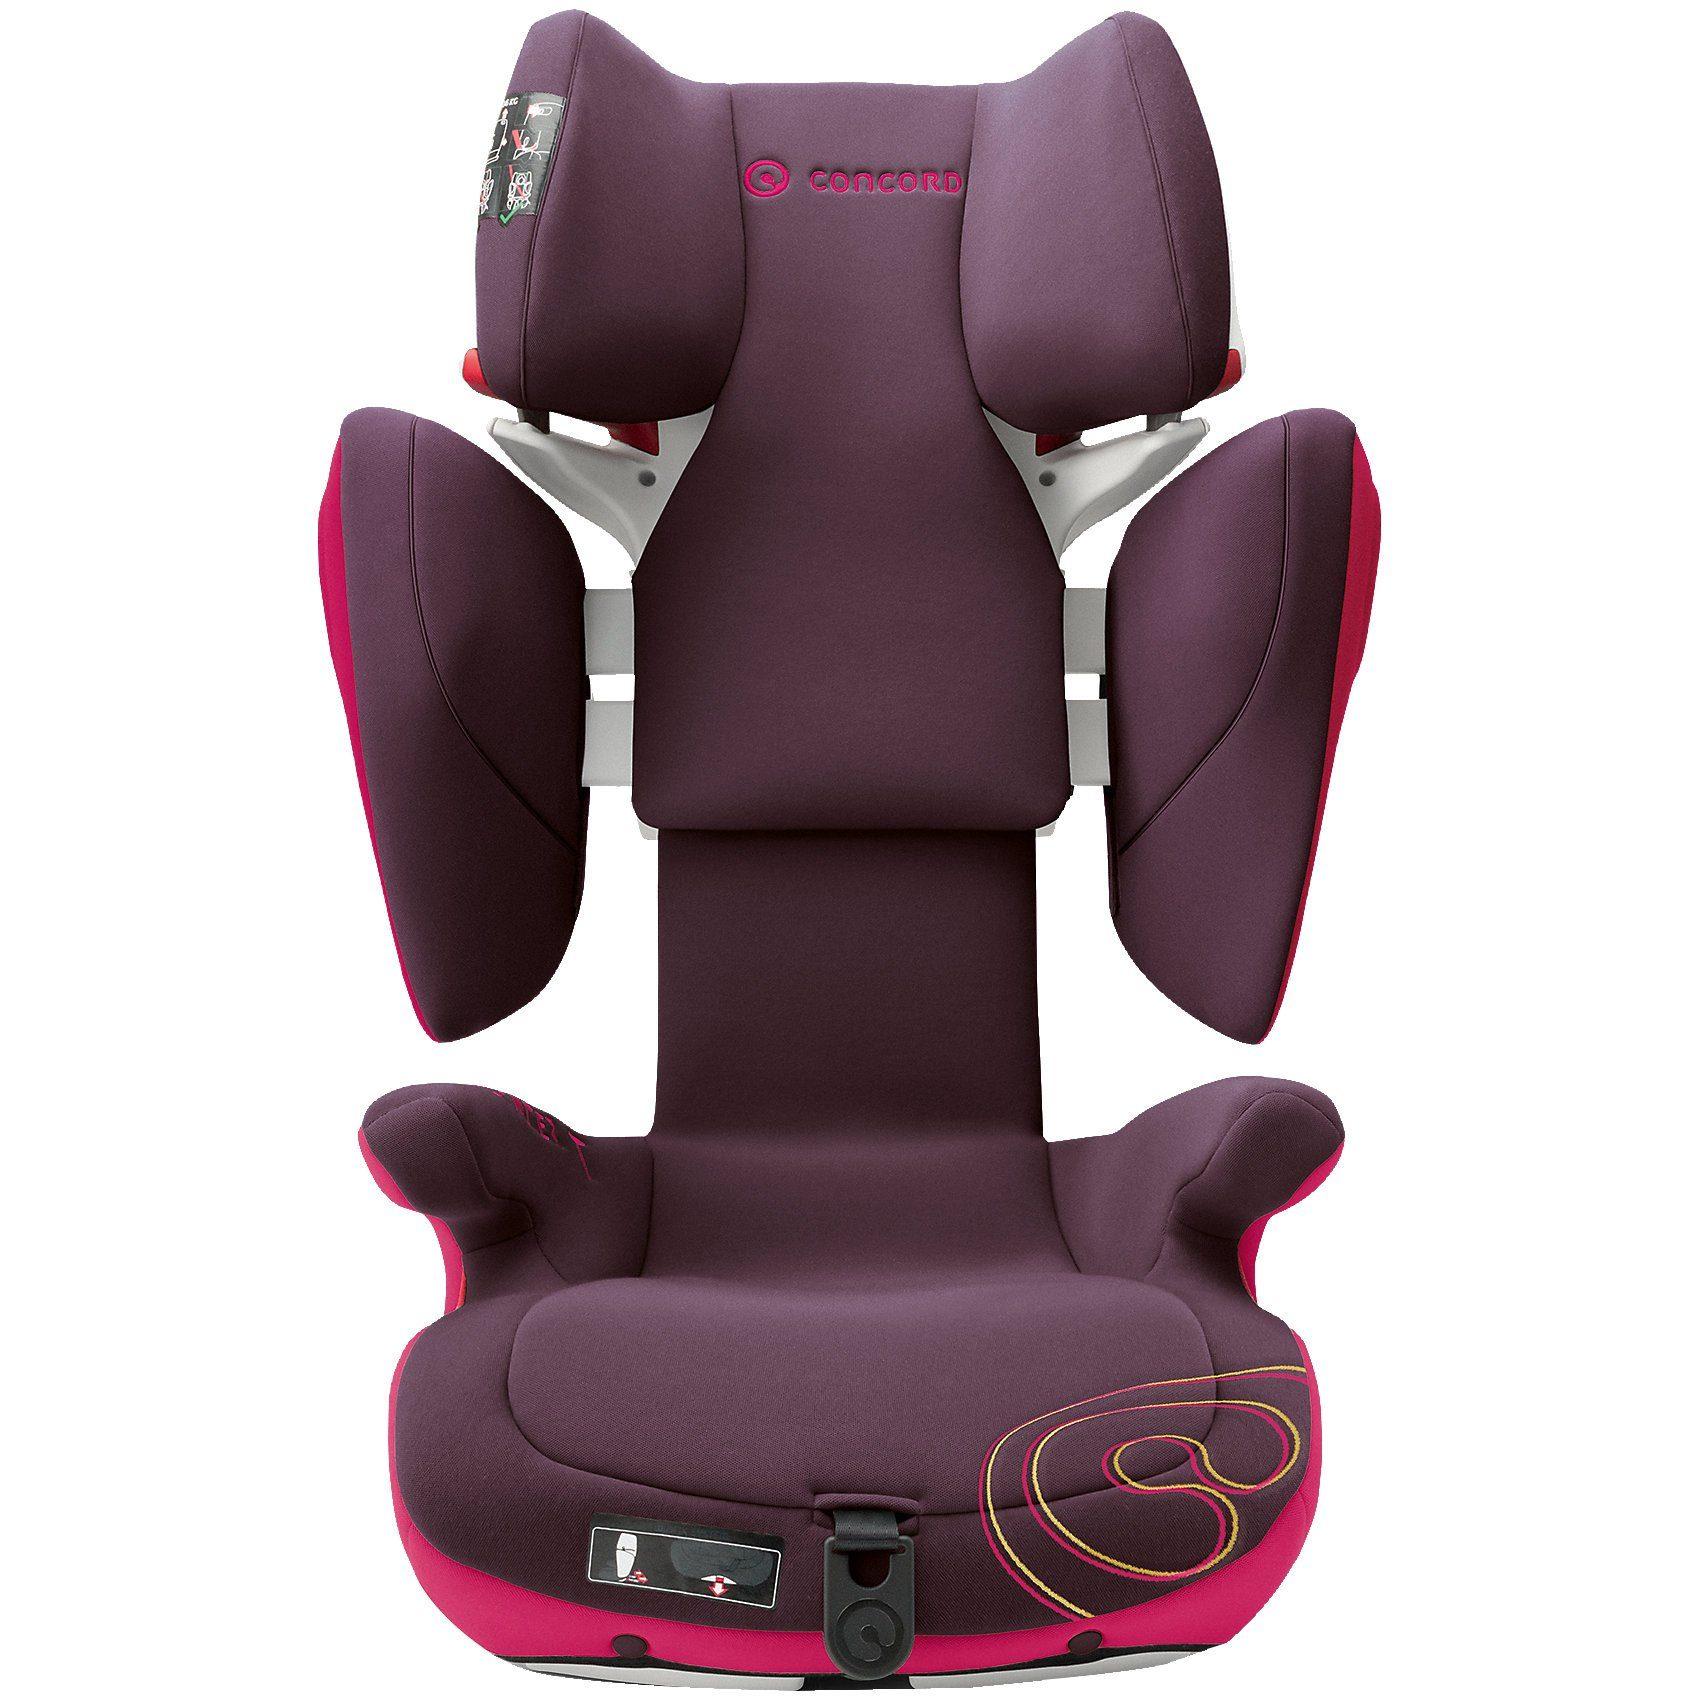 Concord Auto-Kindersitz Transformer T, Rose Pink, 2018